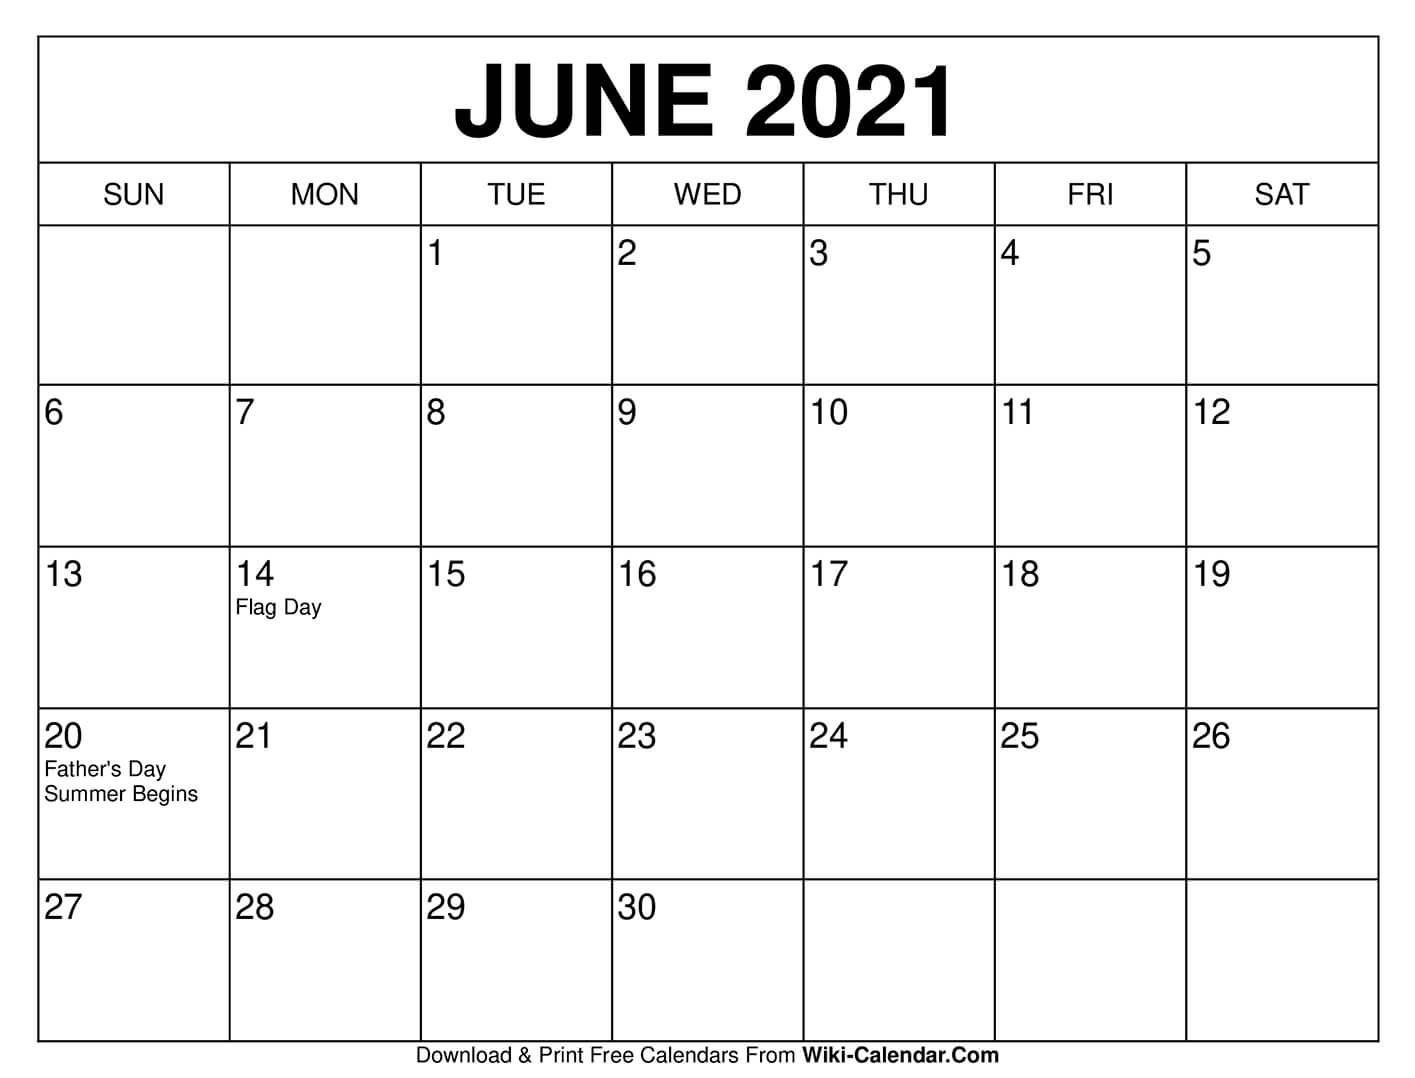 July Calendar 2021 Wiki - April 2021